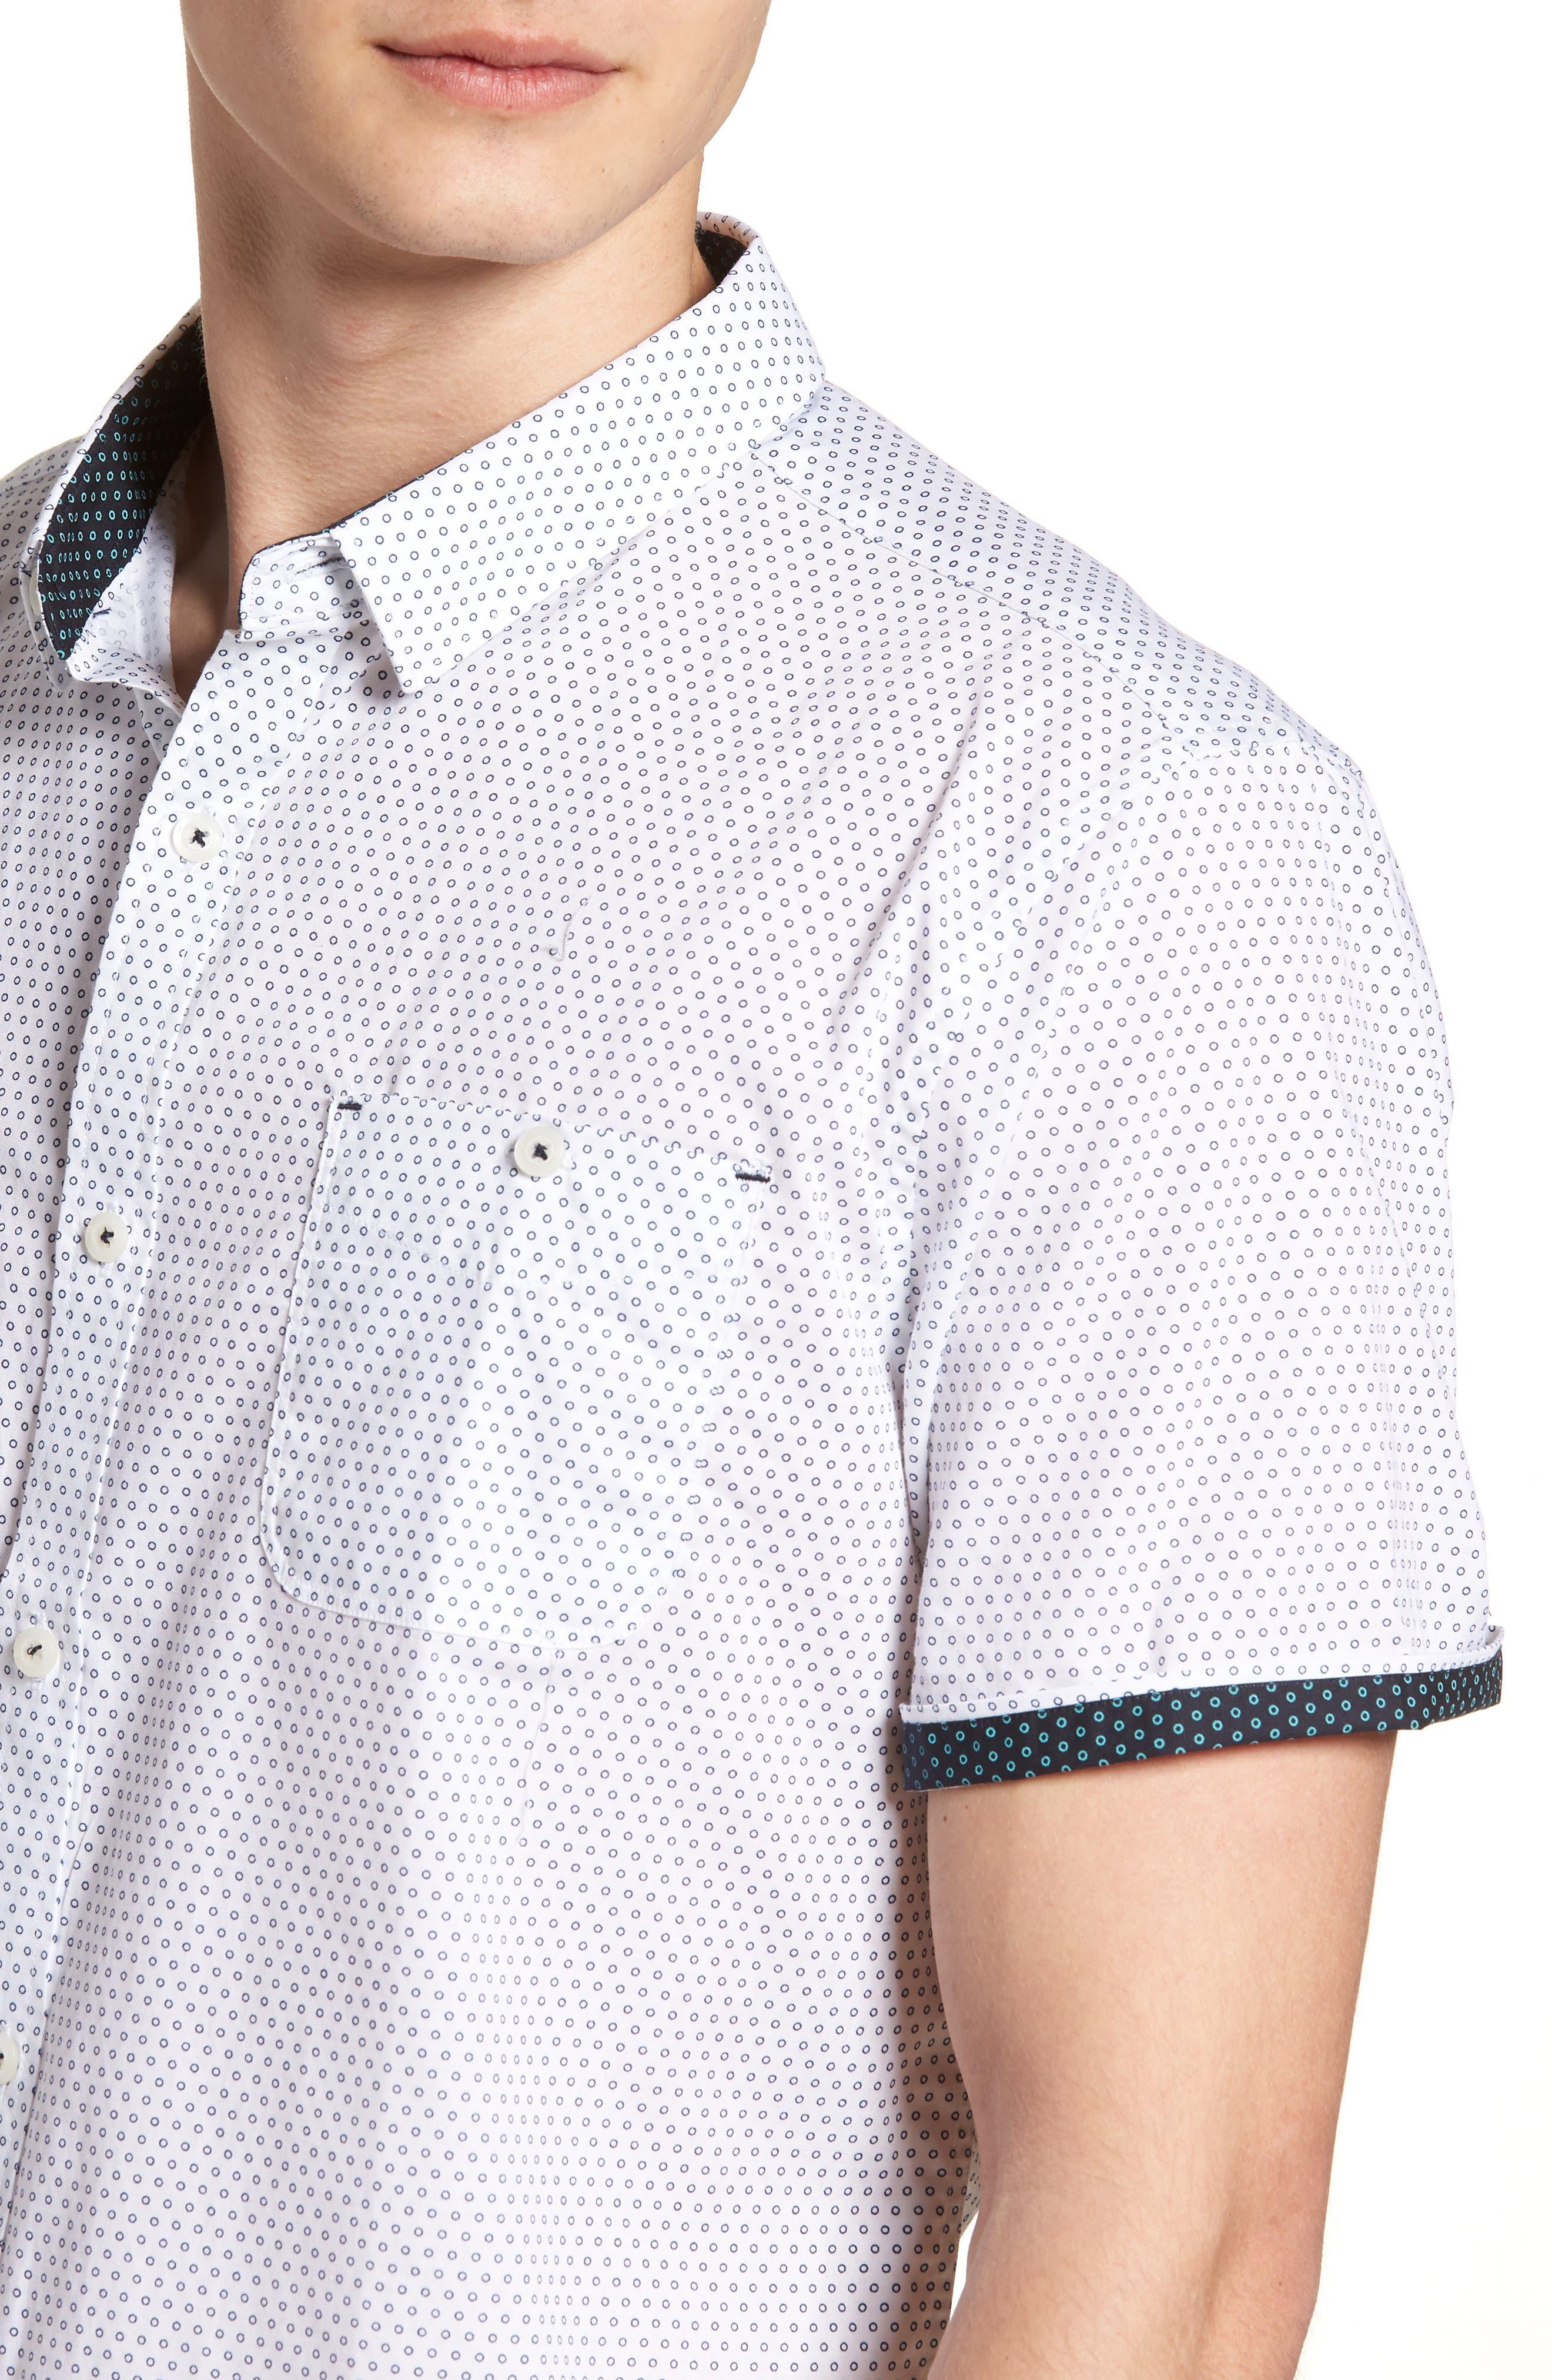 Lights of Home Slim Fit Short Sleeve Sport Shirt,                             Alternate thumbnail 4, color,                             White